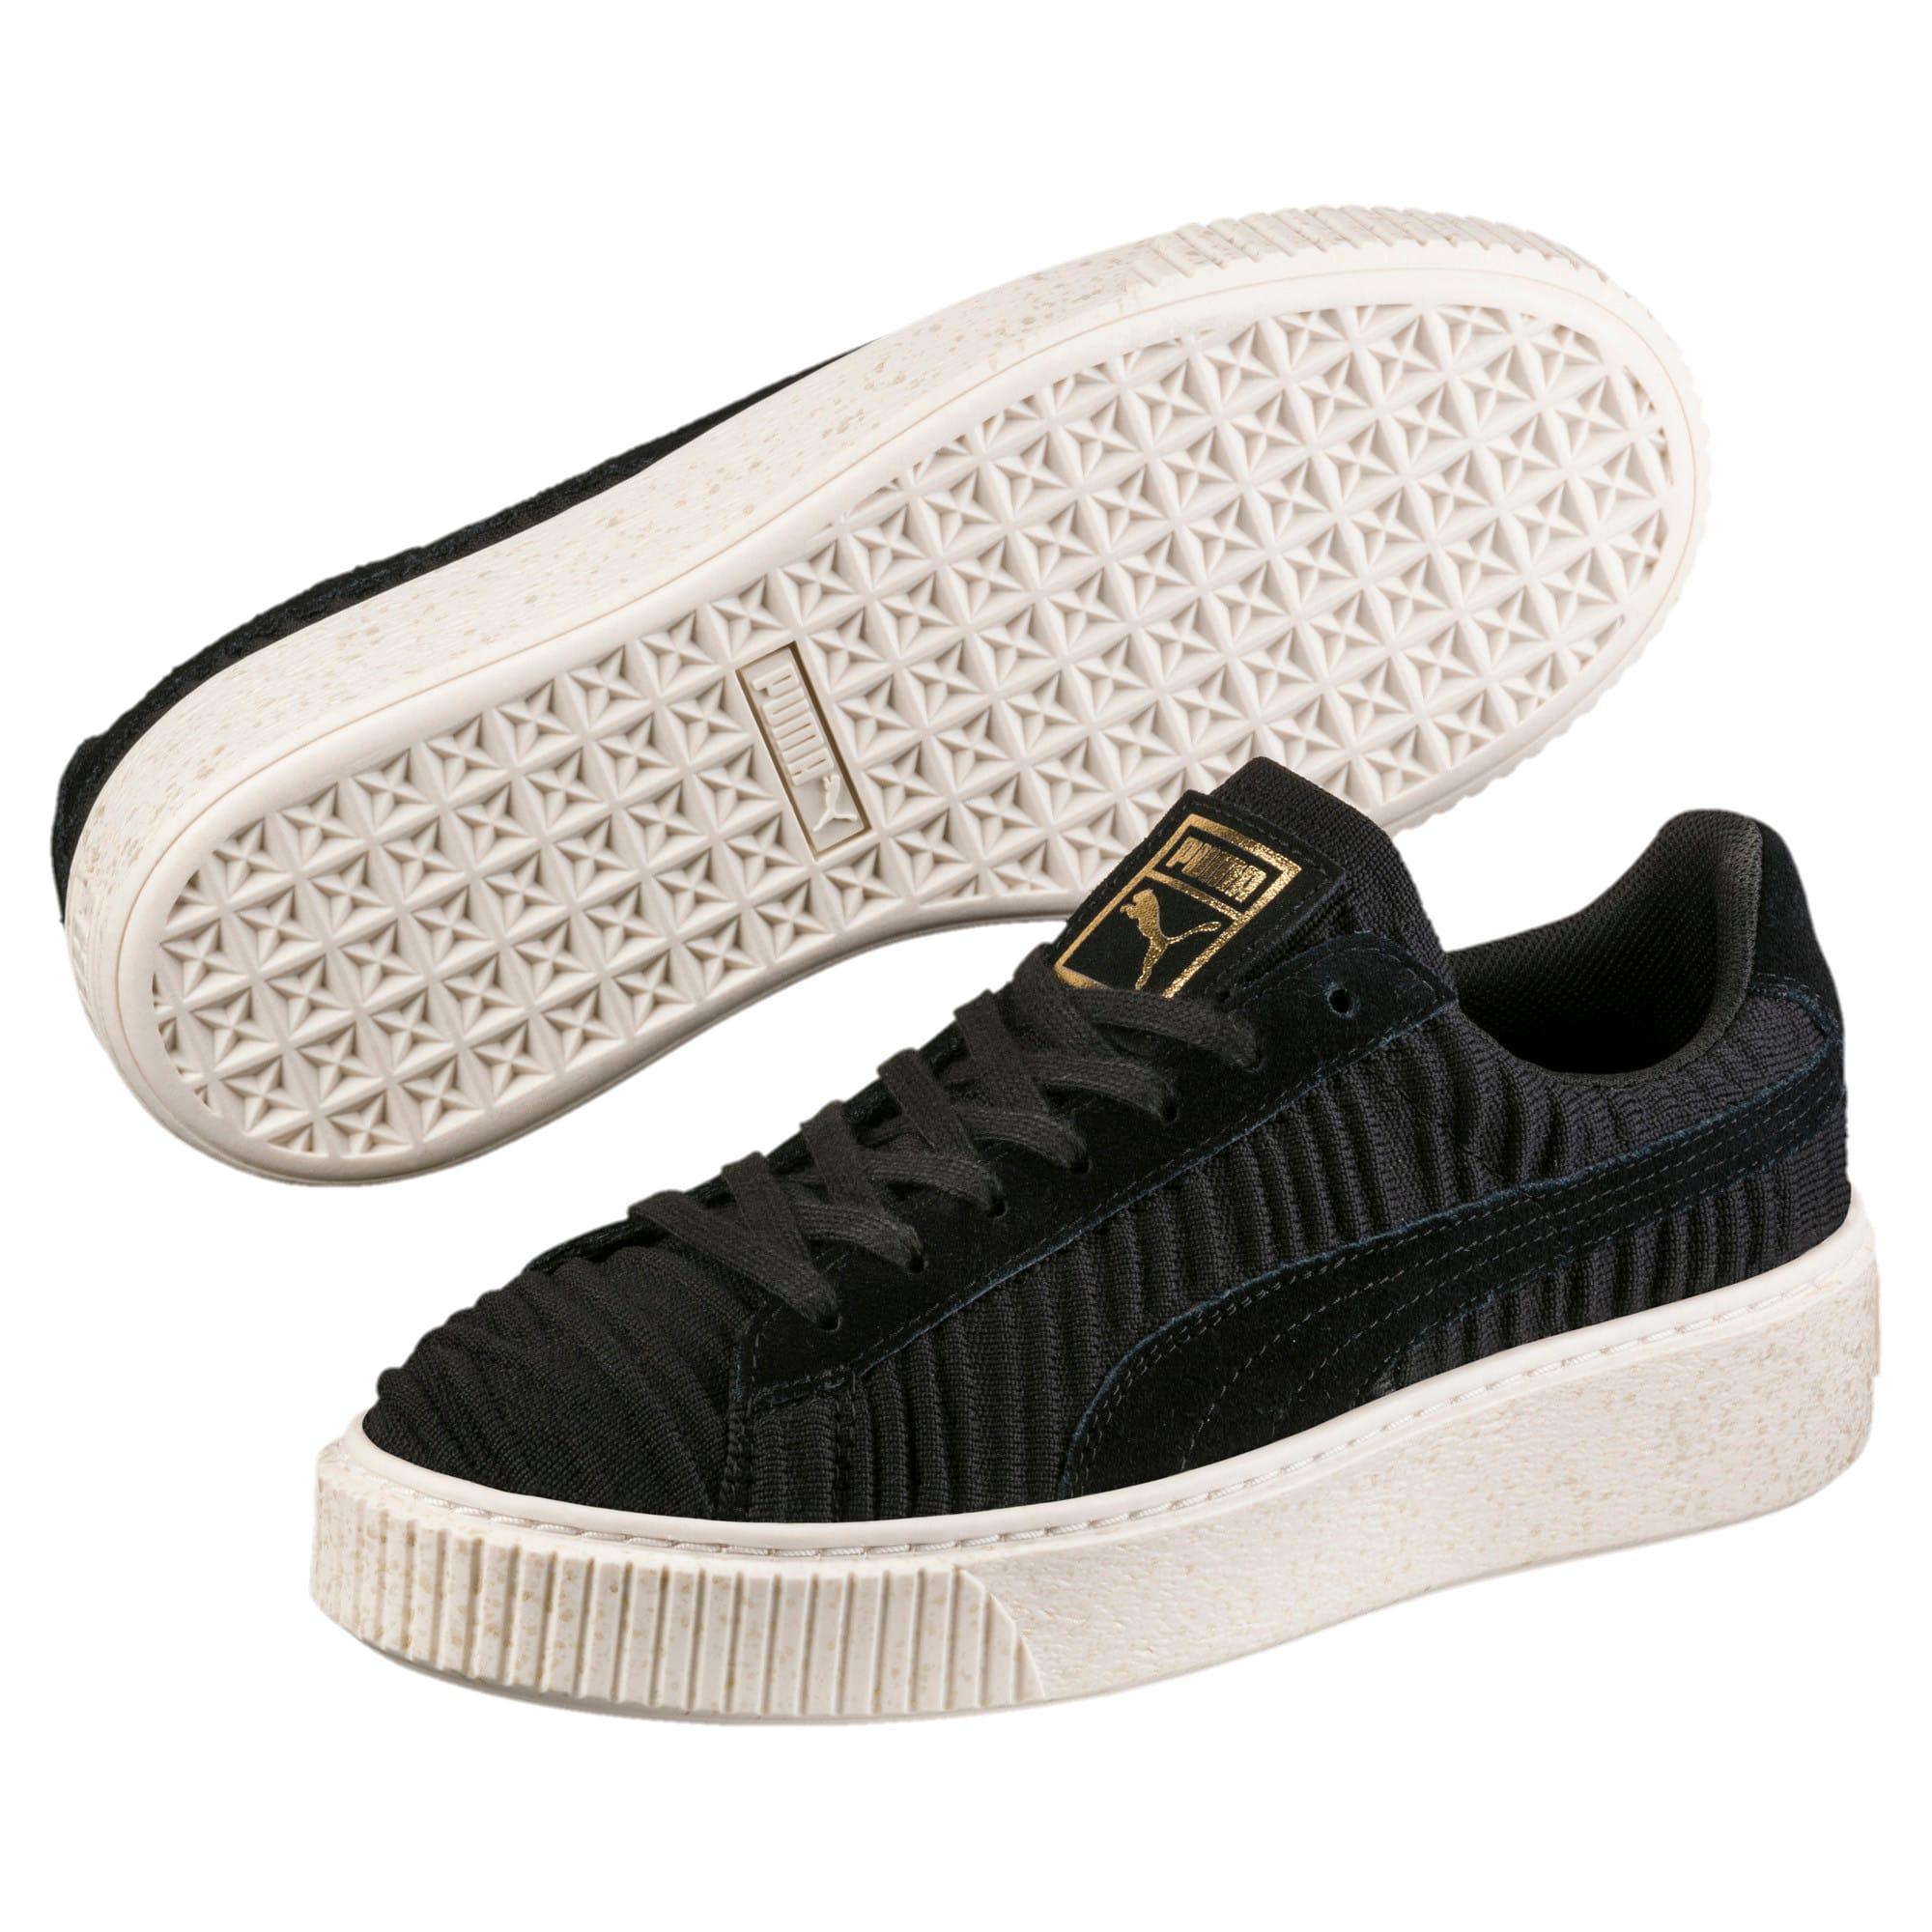 Thumbnail 2 of Basket Platform Women's Sneakers, PBlack-PBlack-Whisper White, medium